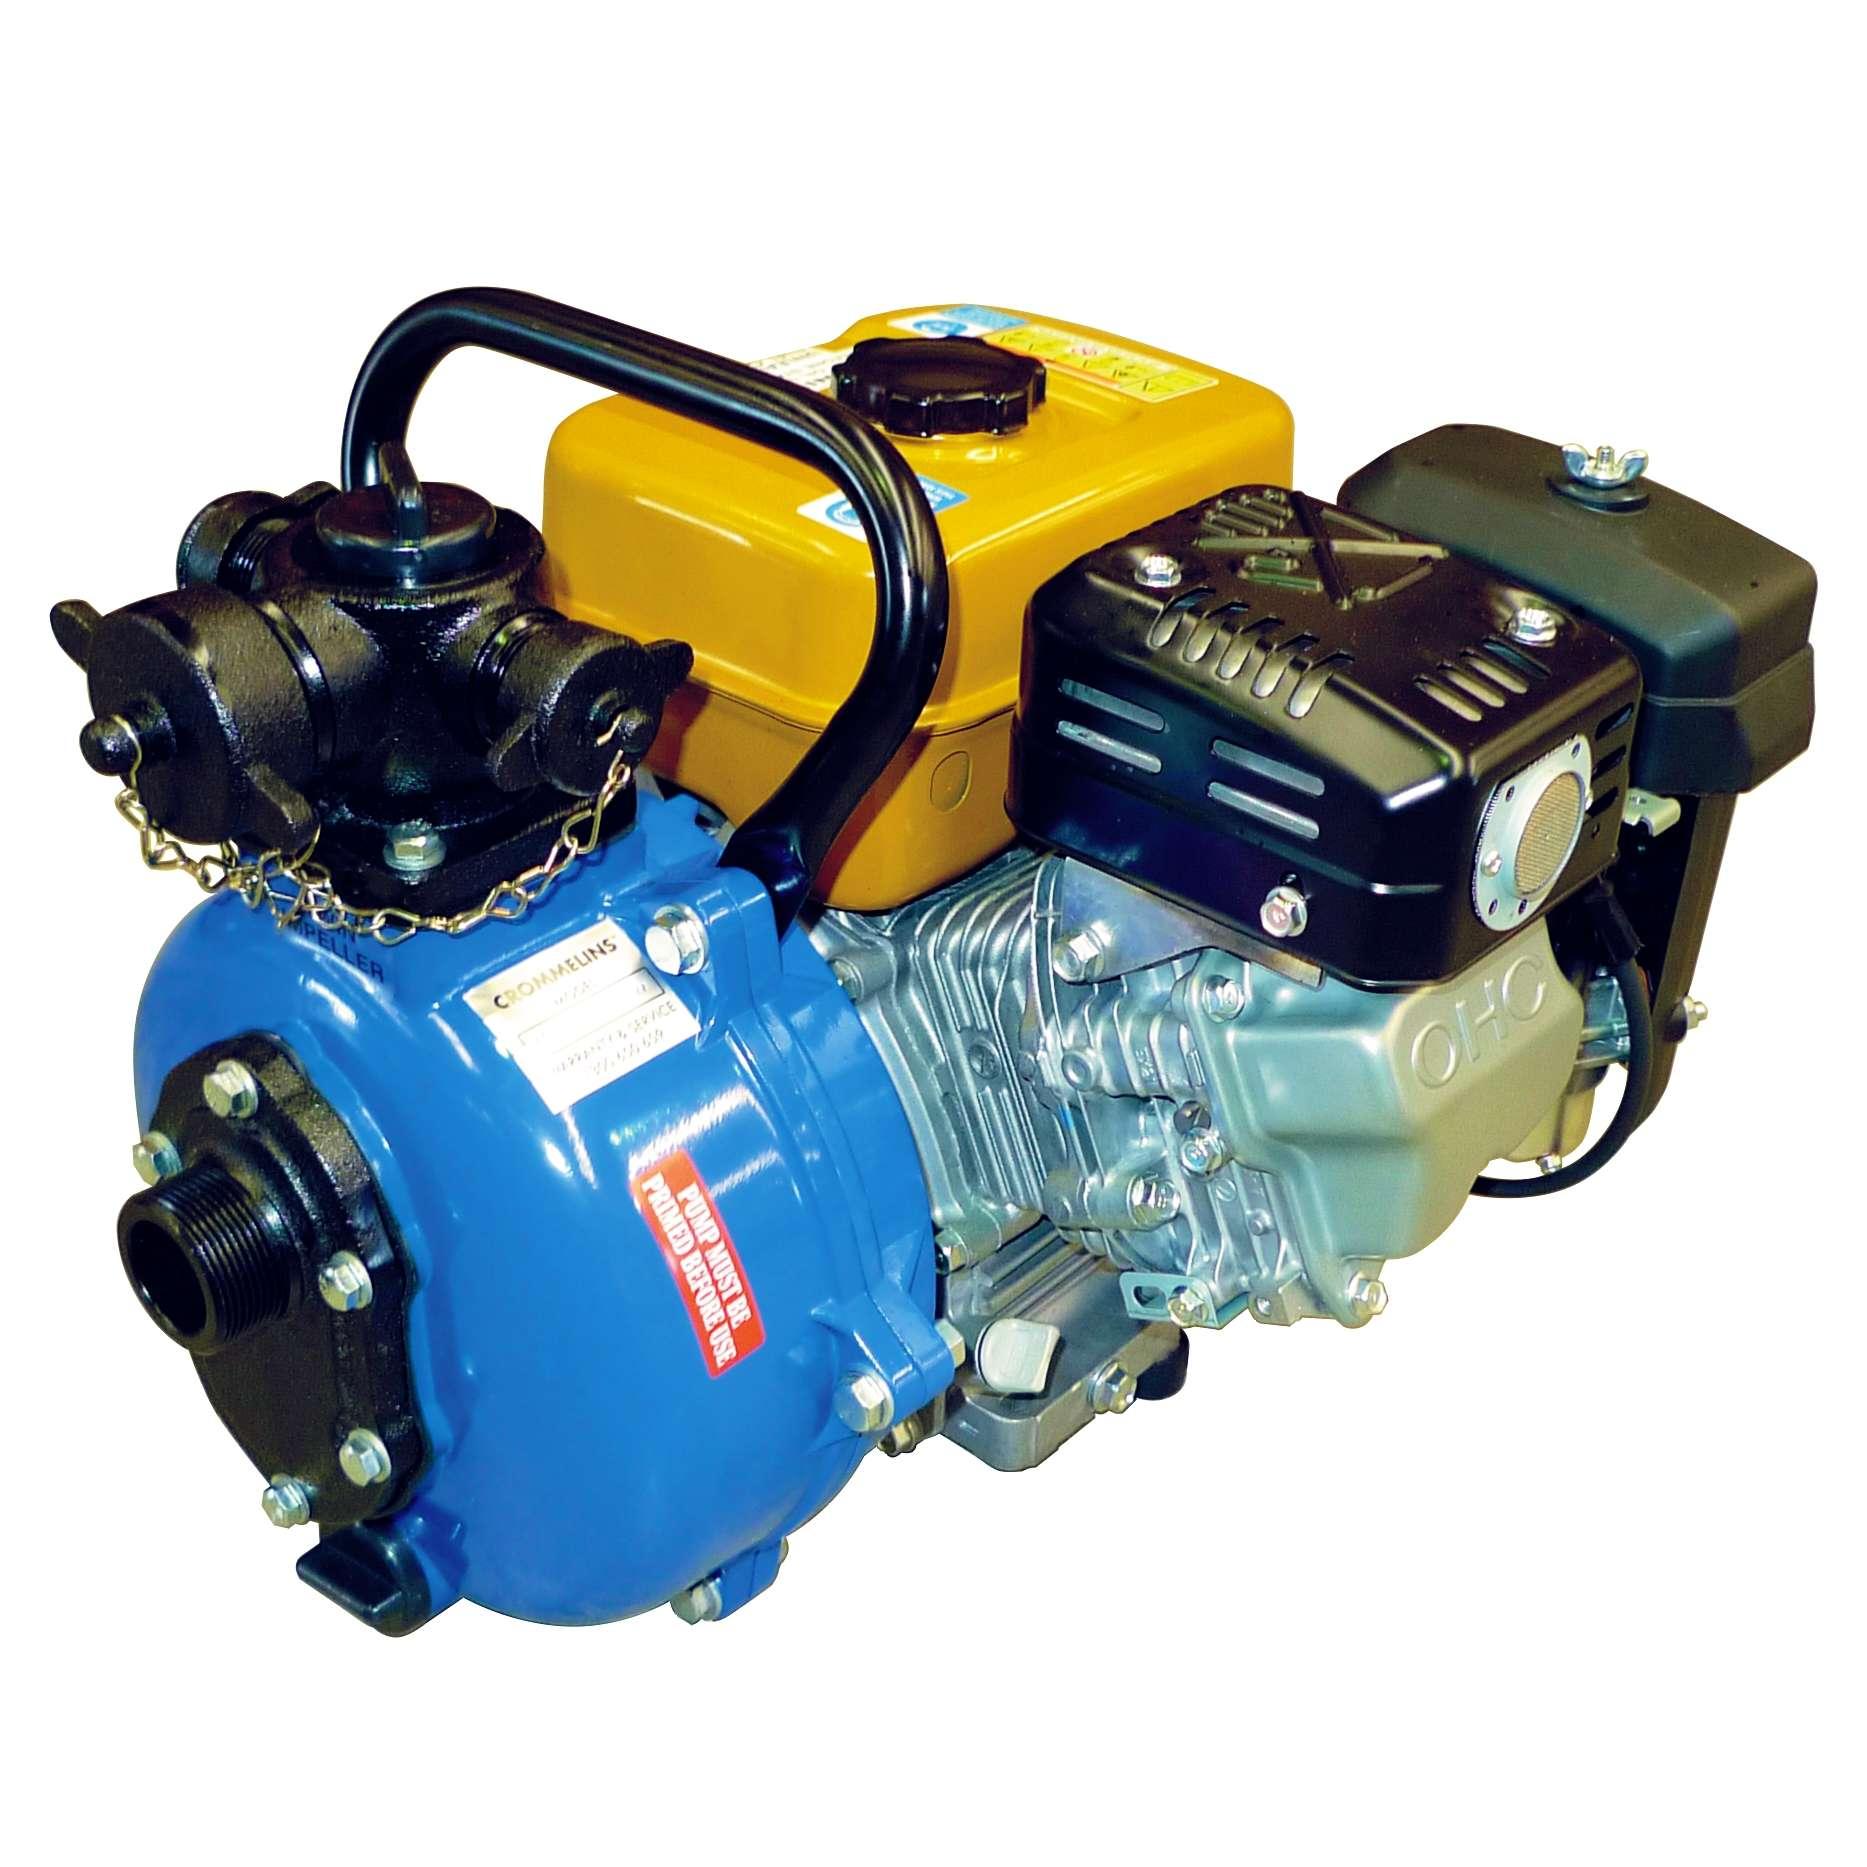 Crommelins Fire Fighting Pump Petrol Twin Impeller 7 0hp | Crommelins  Machinery